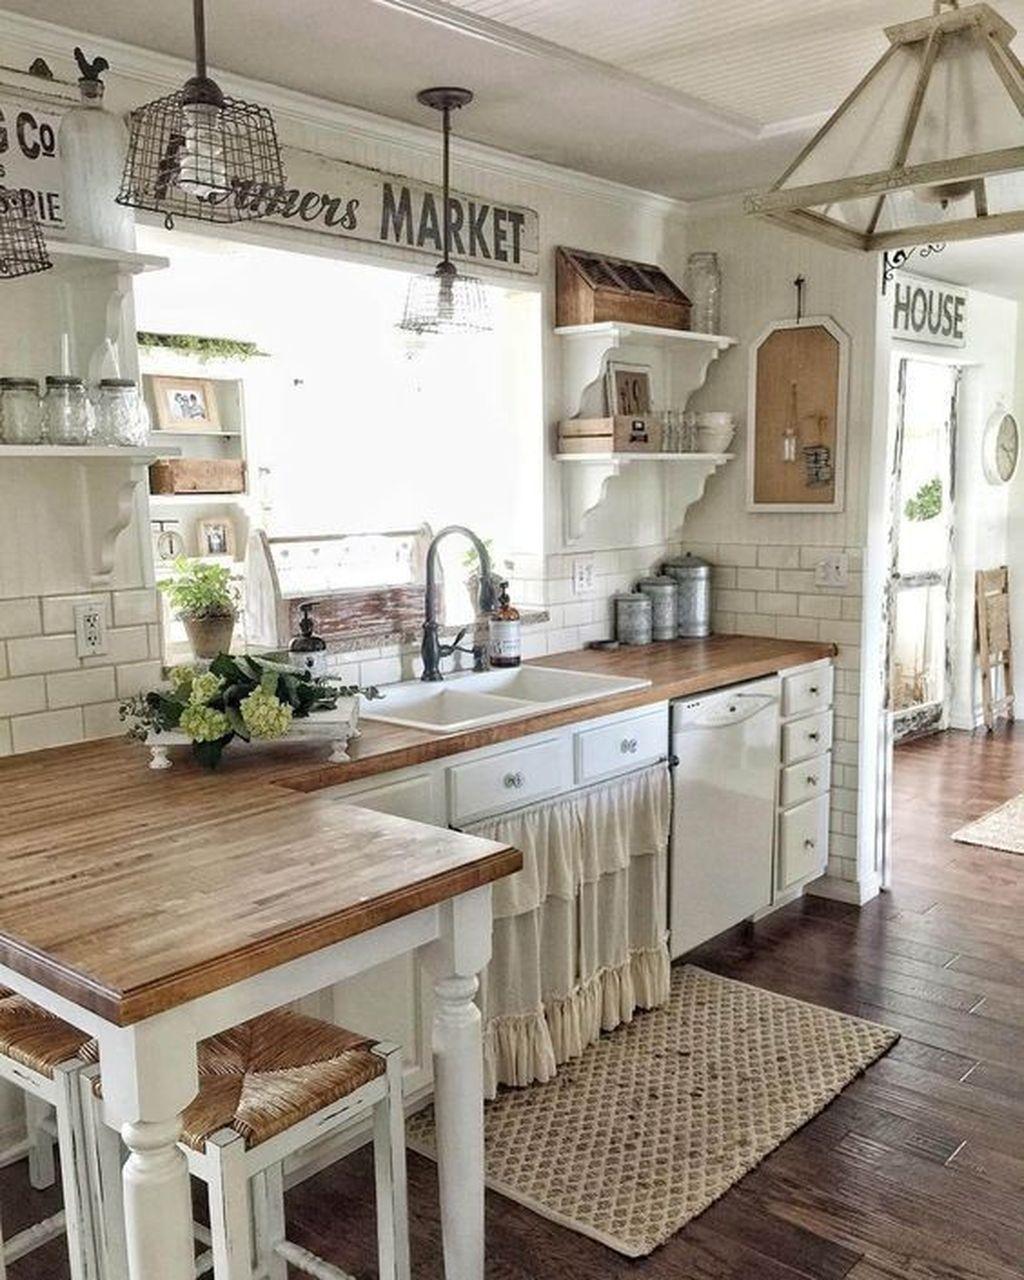 53 Beautiful Cottage Kitchen Design Ideas Kitchen 53 Beautiful